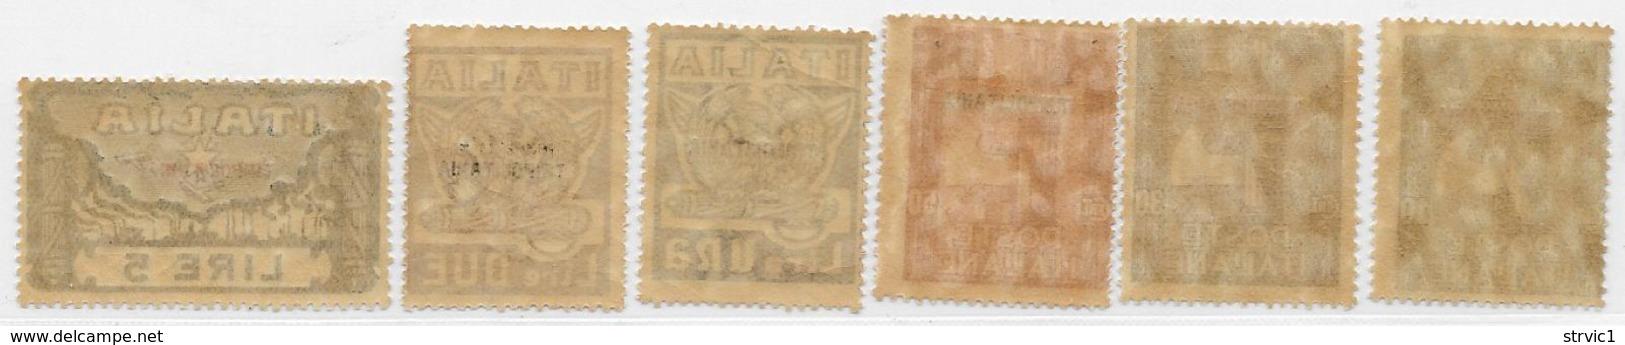 Tripolitania, Scott # 5-10 MNH Italy Fascisti Issue,overprinted,1923, CV$225.00 - Tripolitania